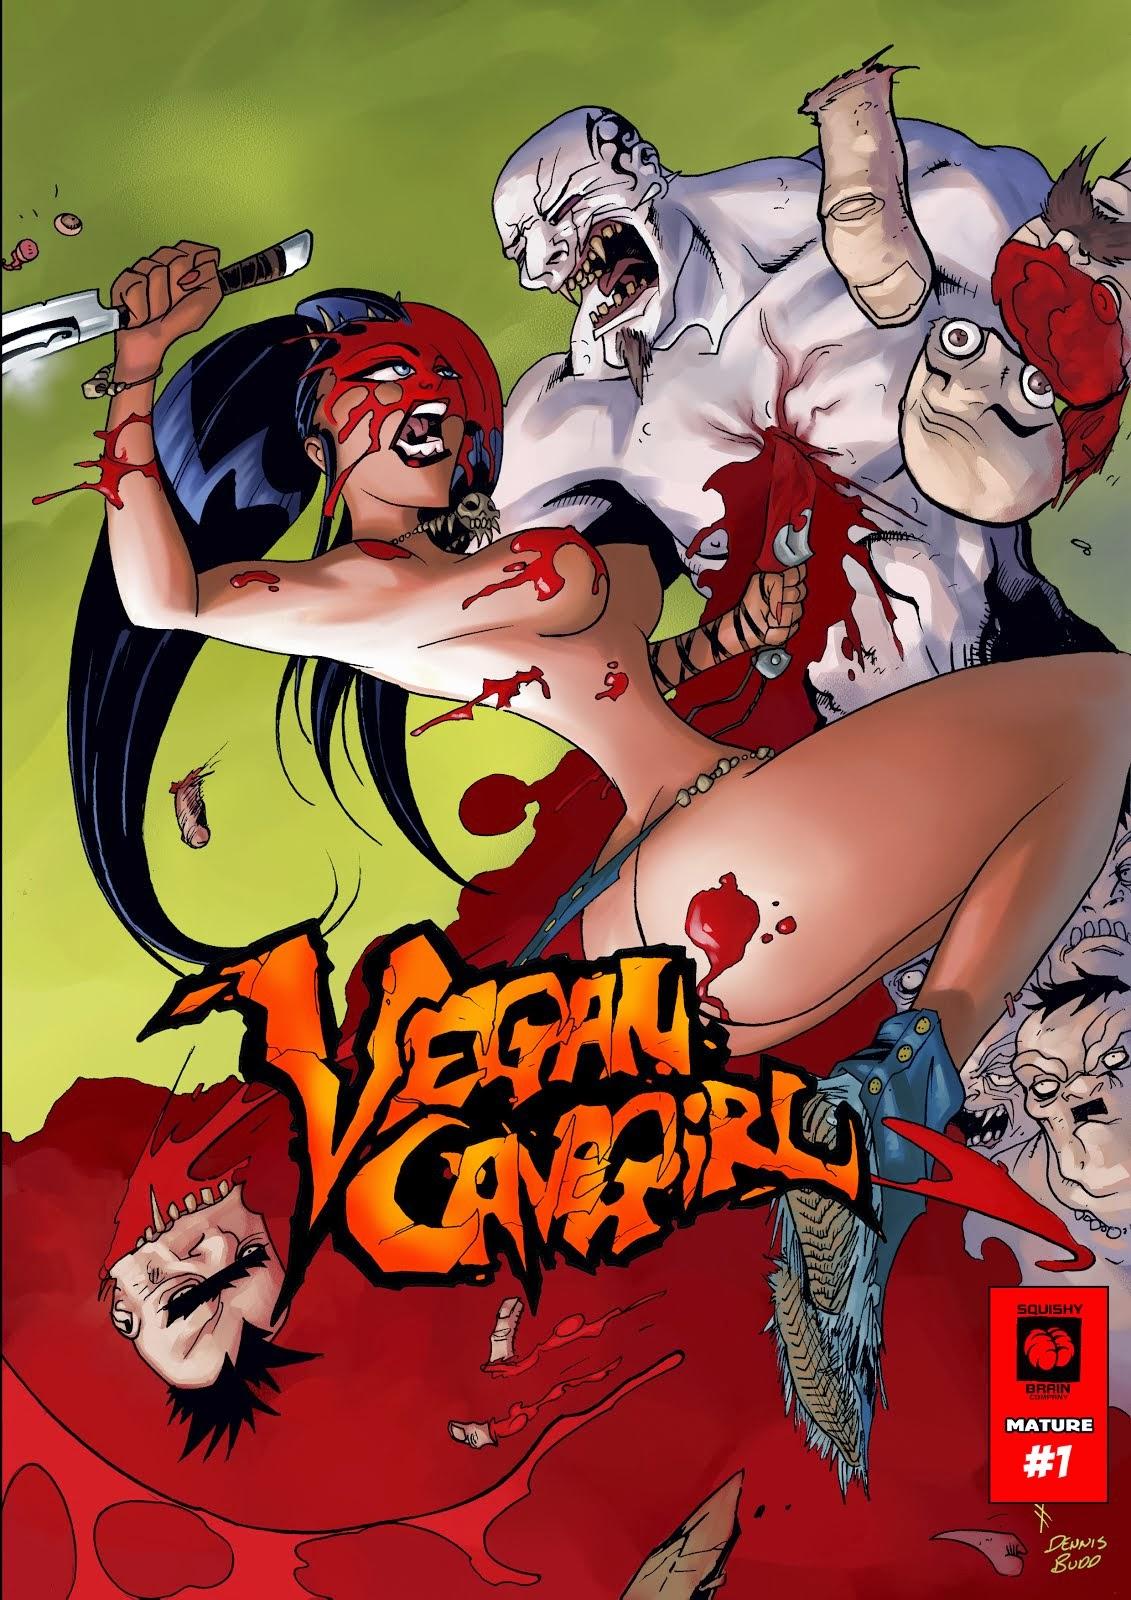 VeganCaveGirl Digital #1